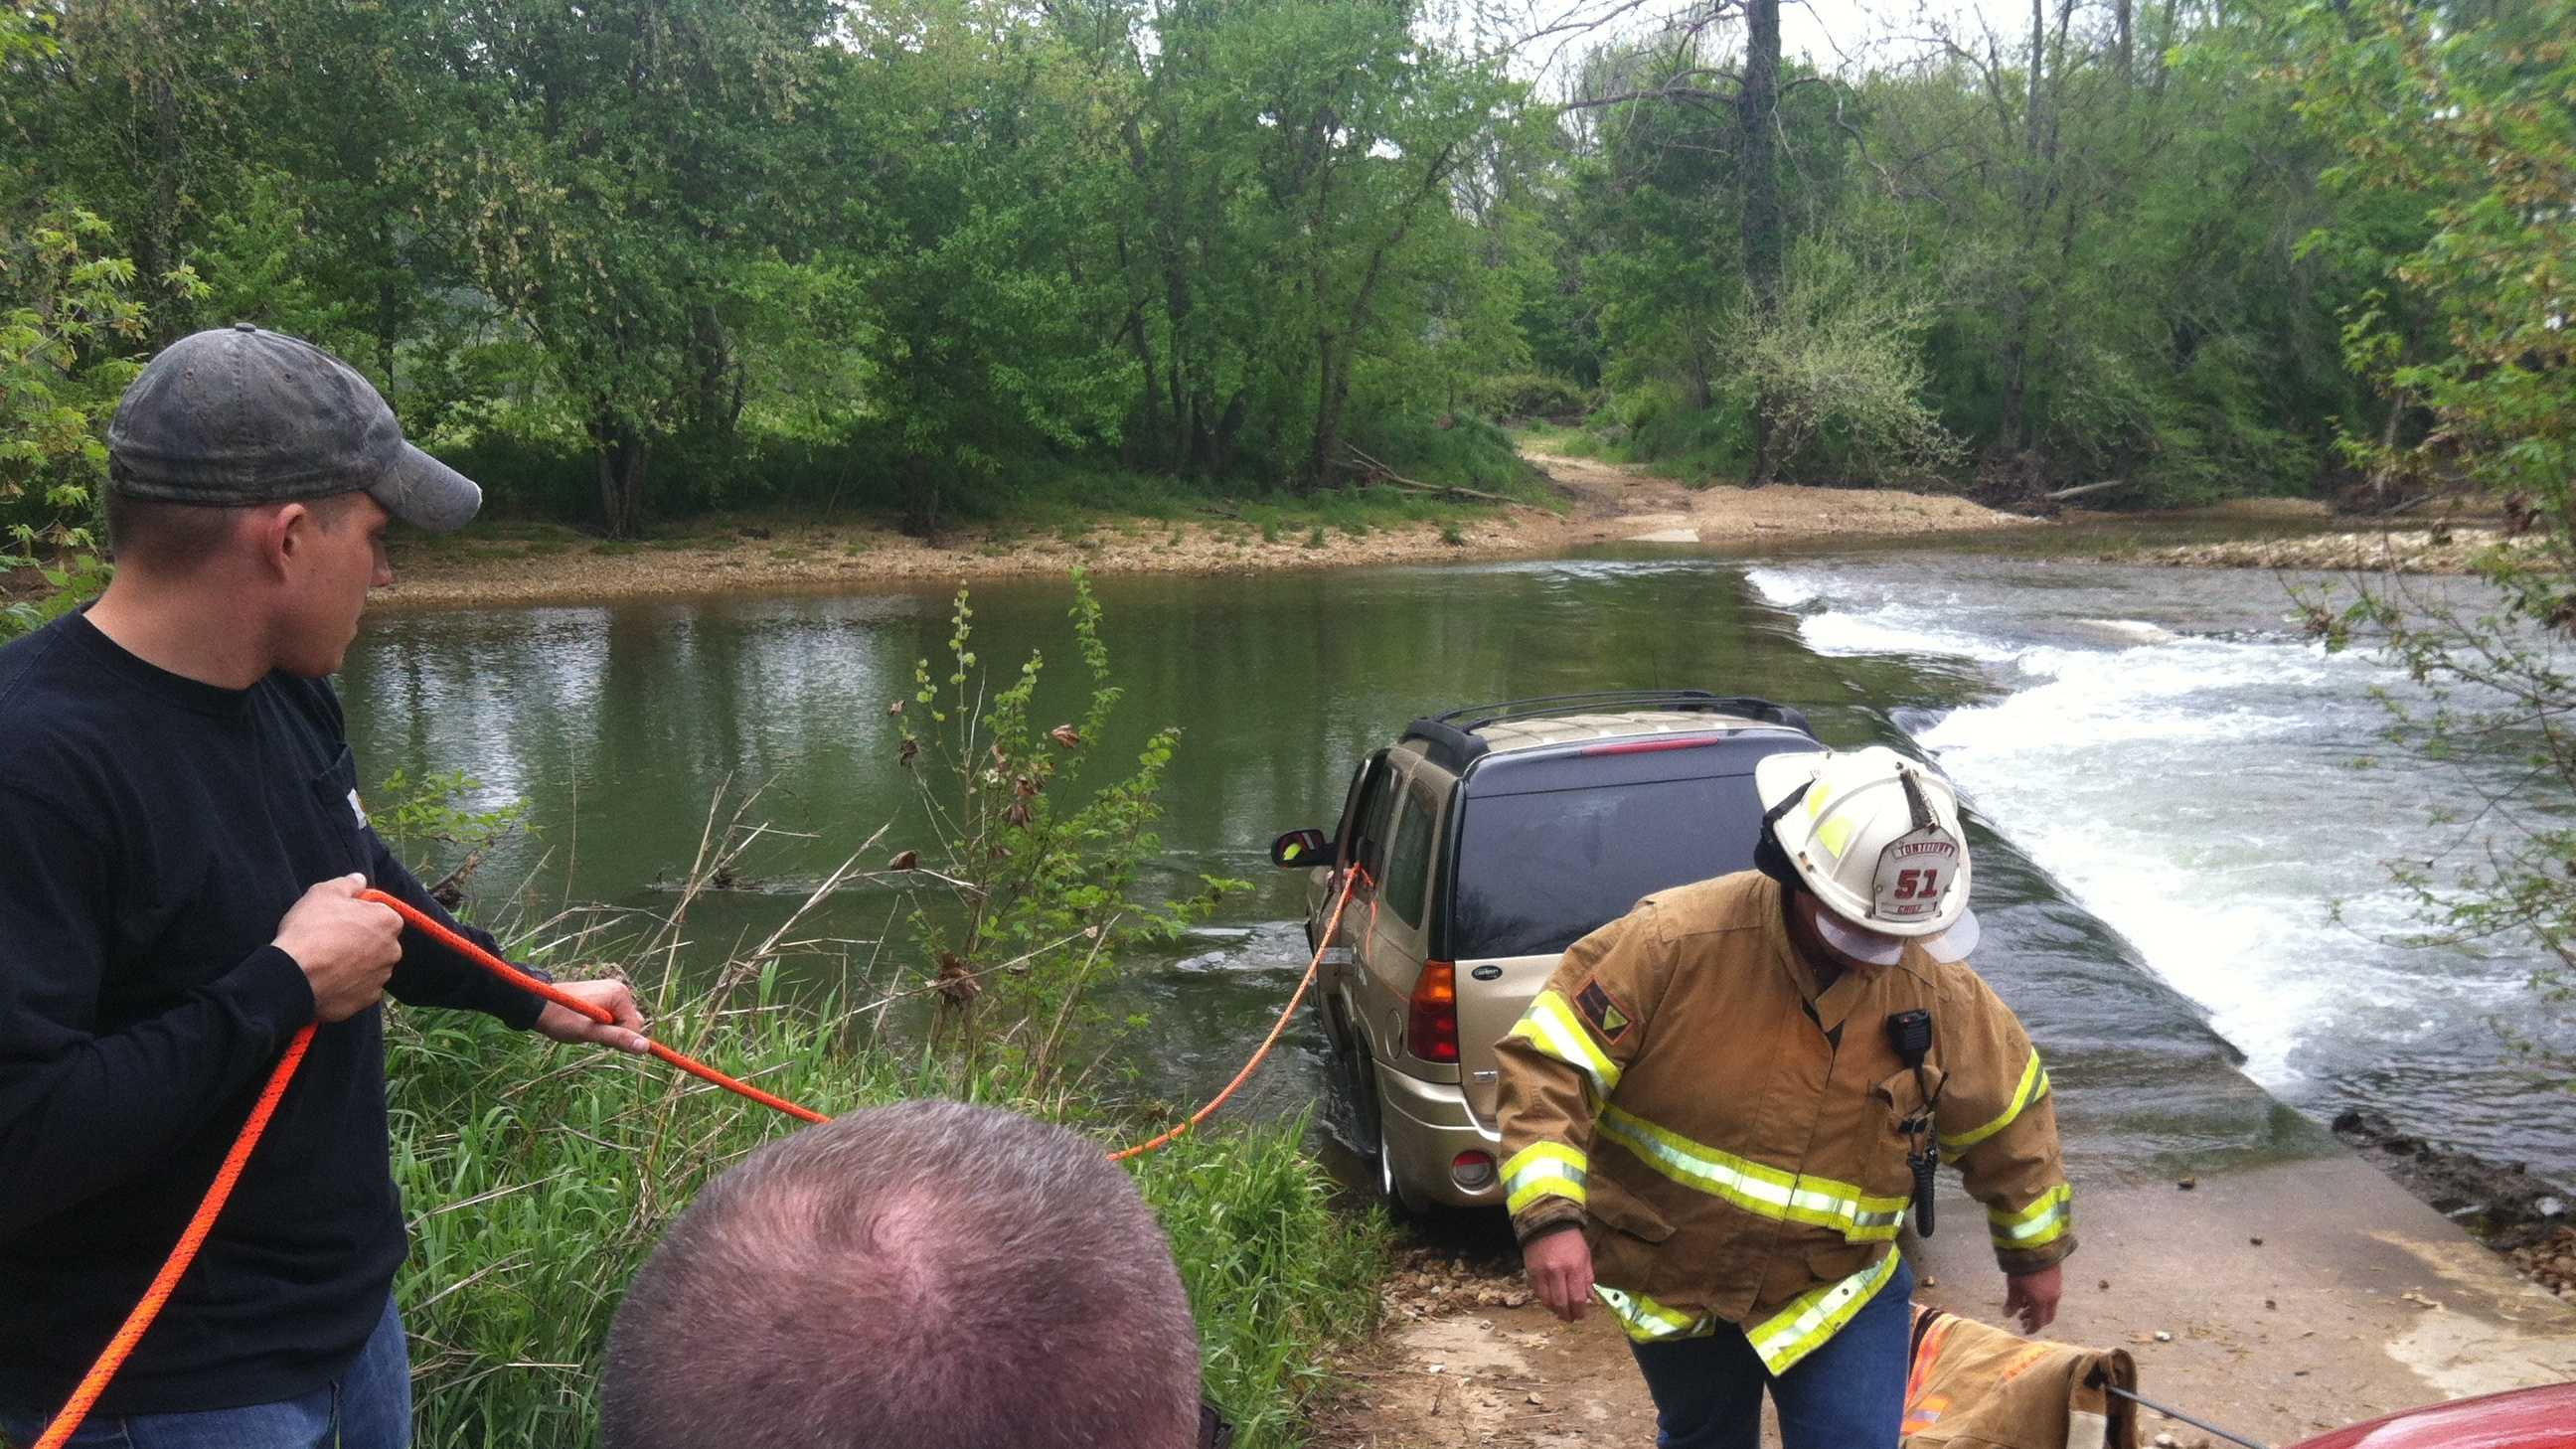 Emergency crews respond to water rescue on bridge